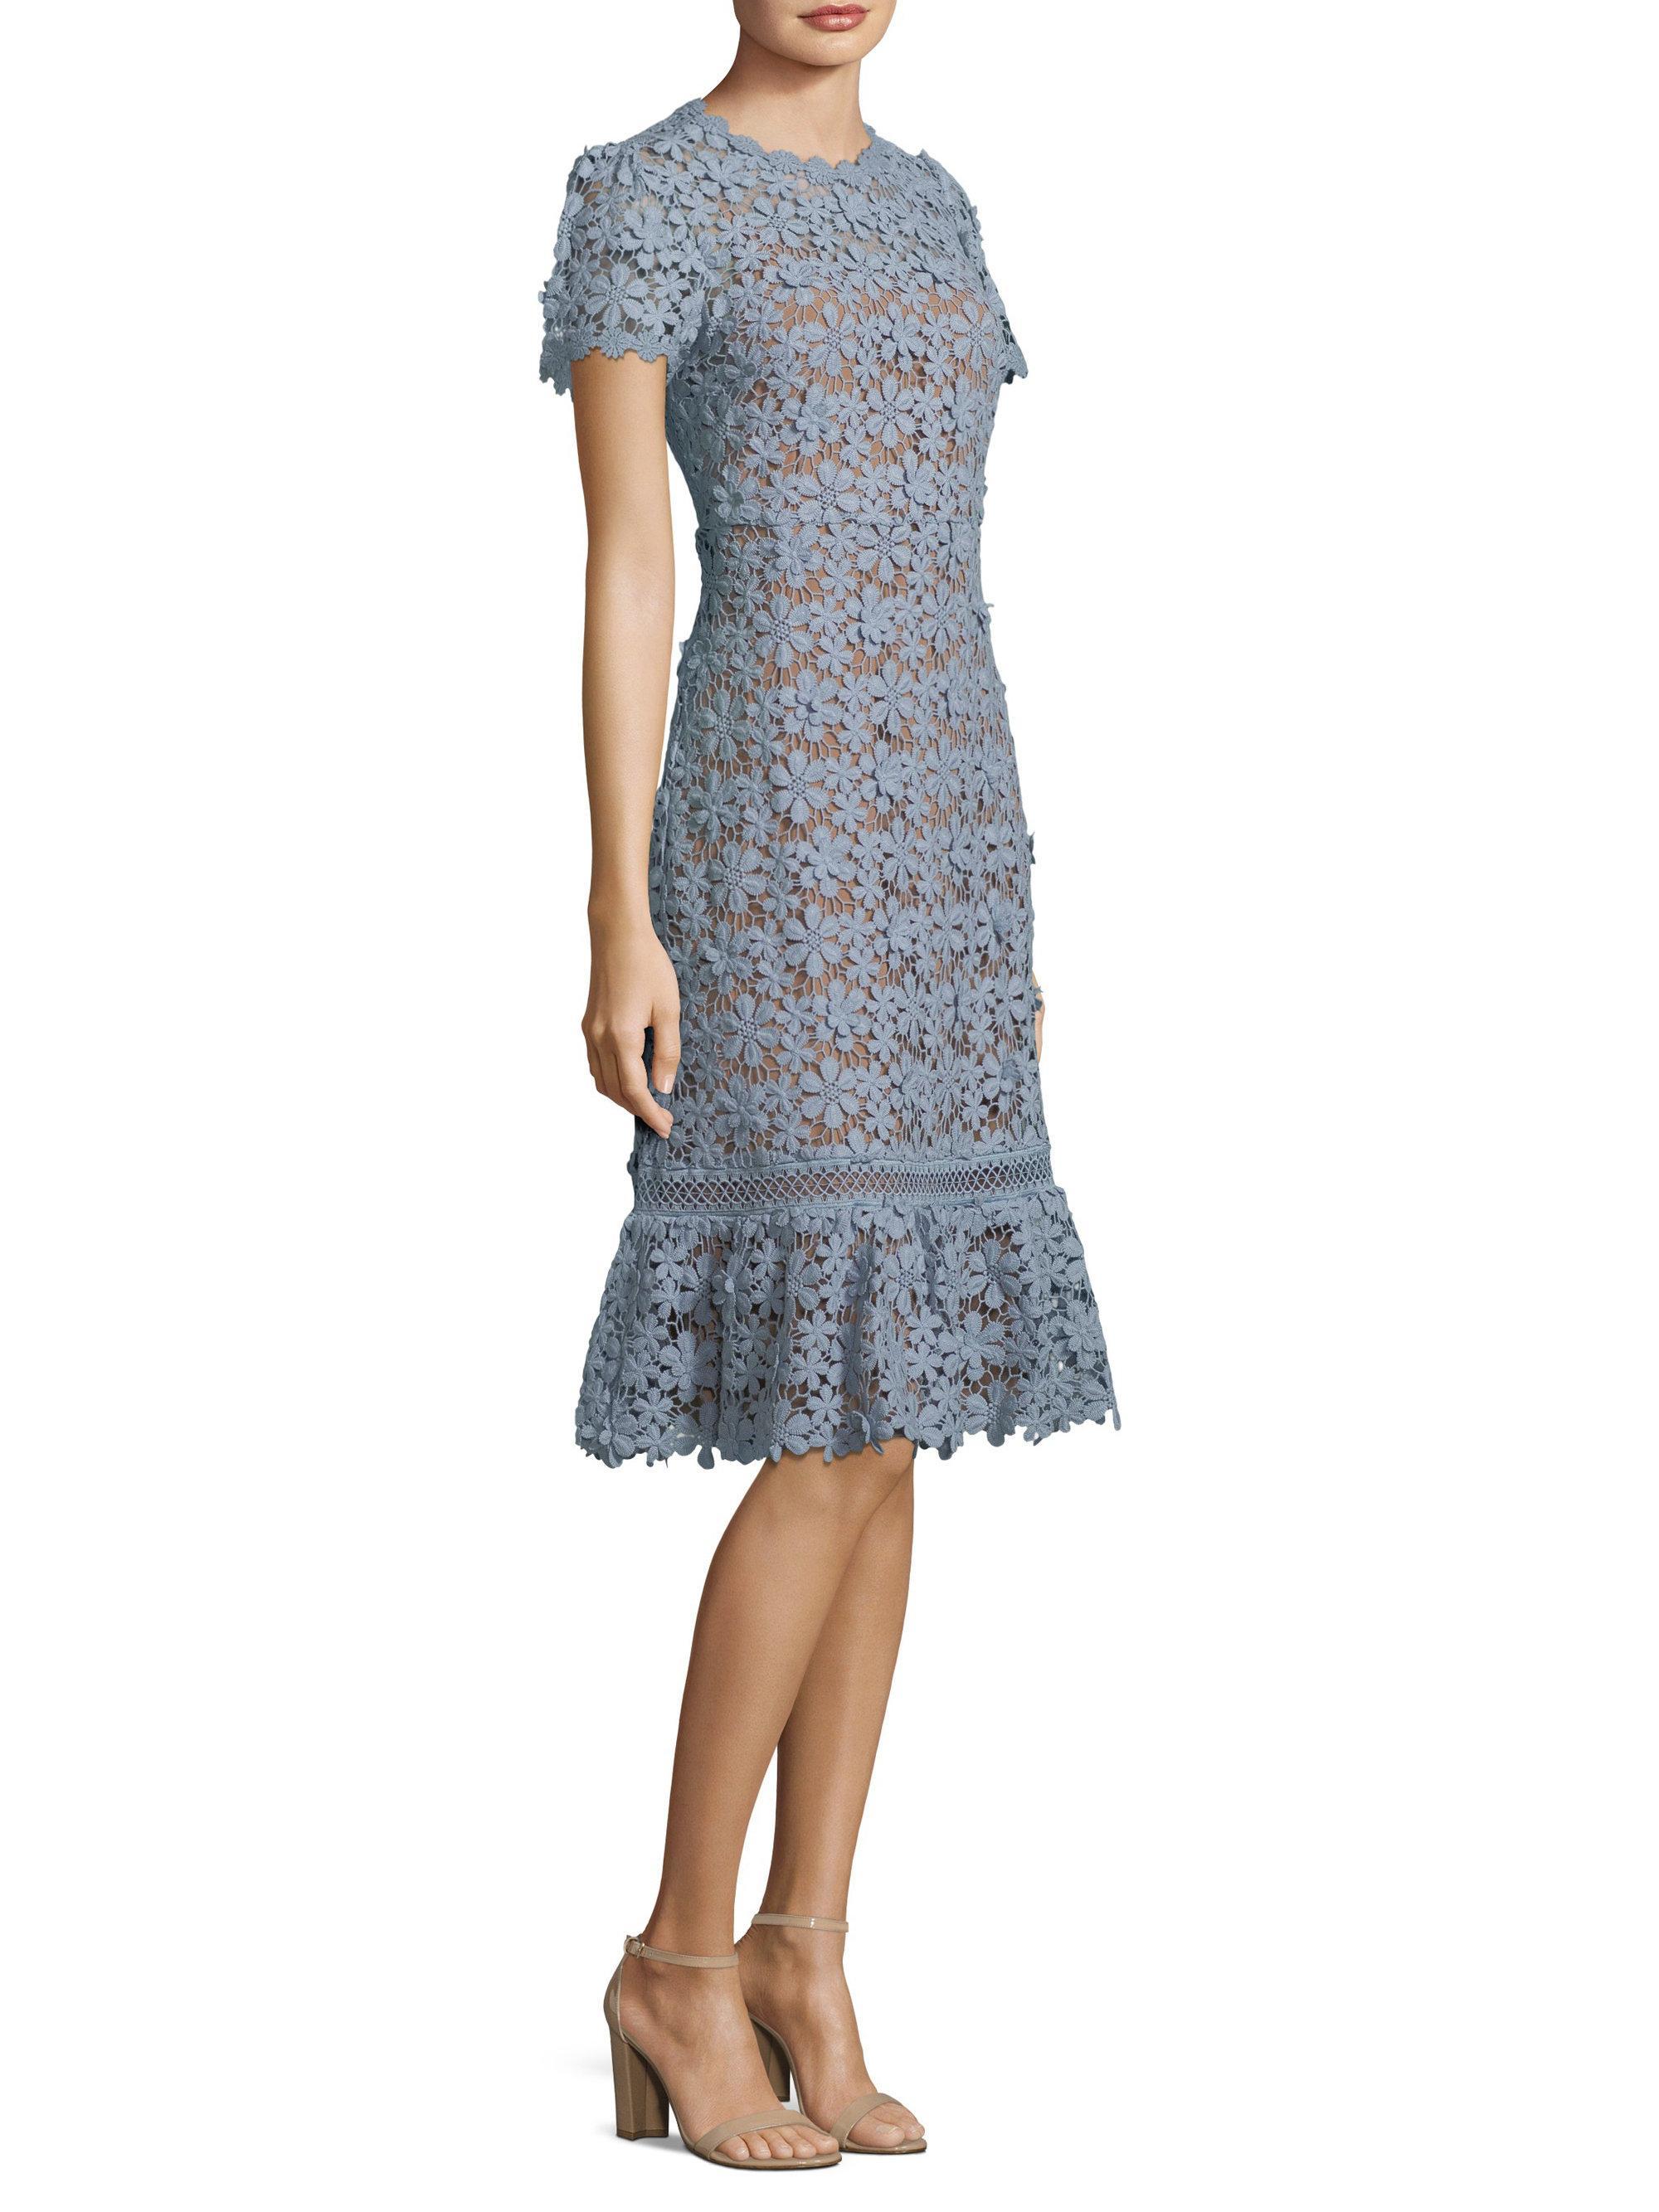 7c8ca810 MICHAEL Michael Kors Floral Lace A-line Dress in Blue - Lyst